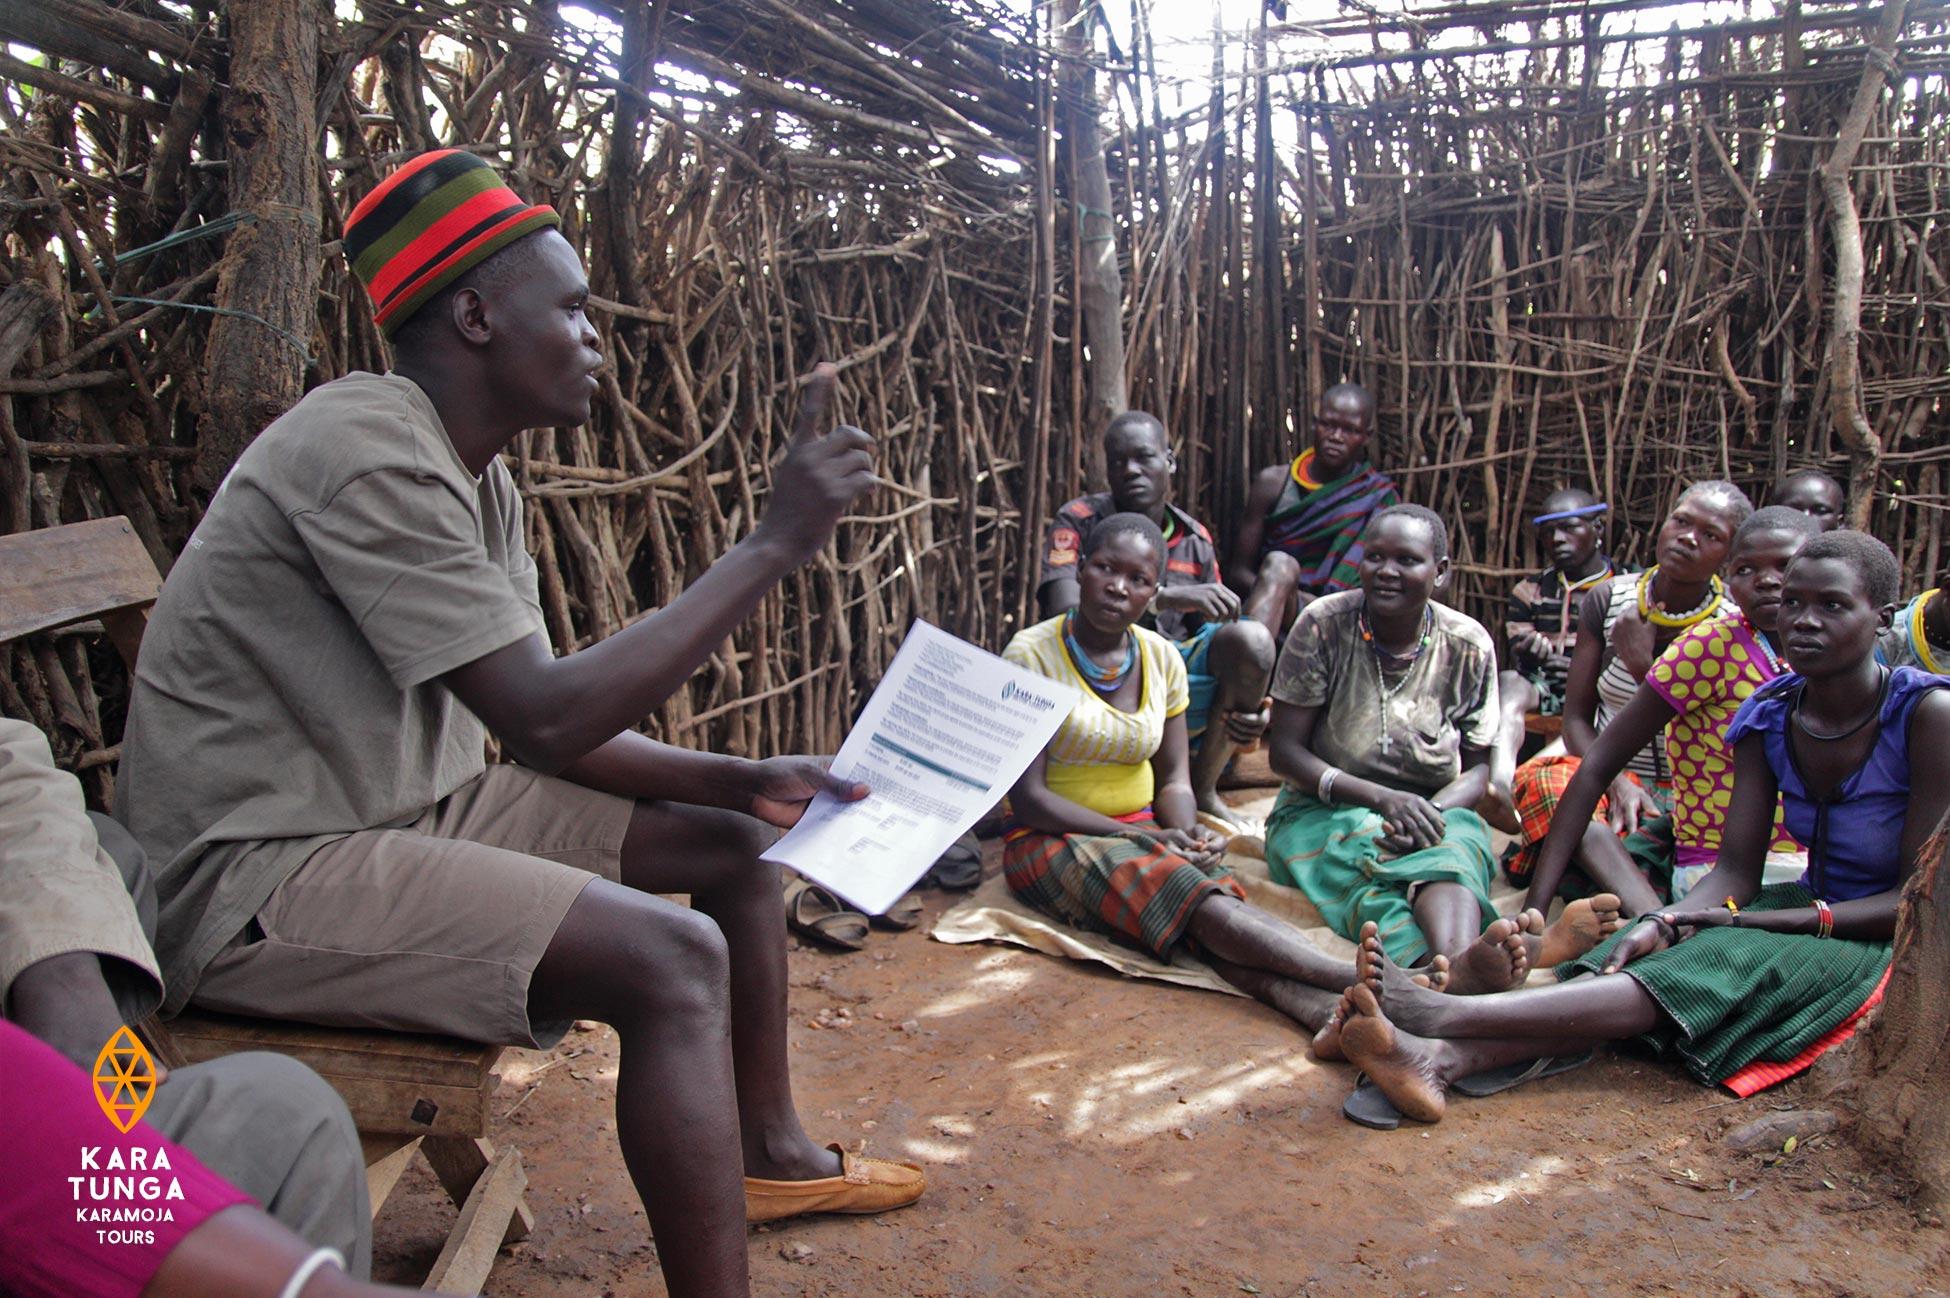 Kara-Tunga Karamoja Community Village Tours